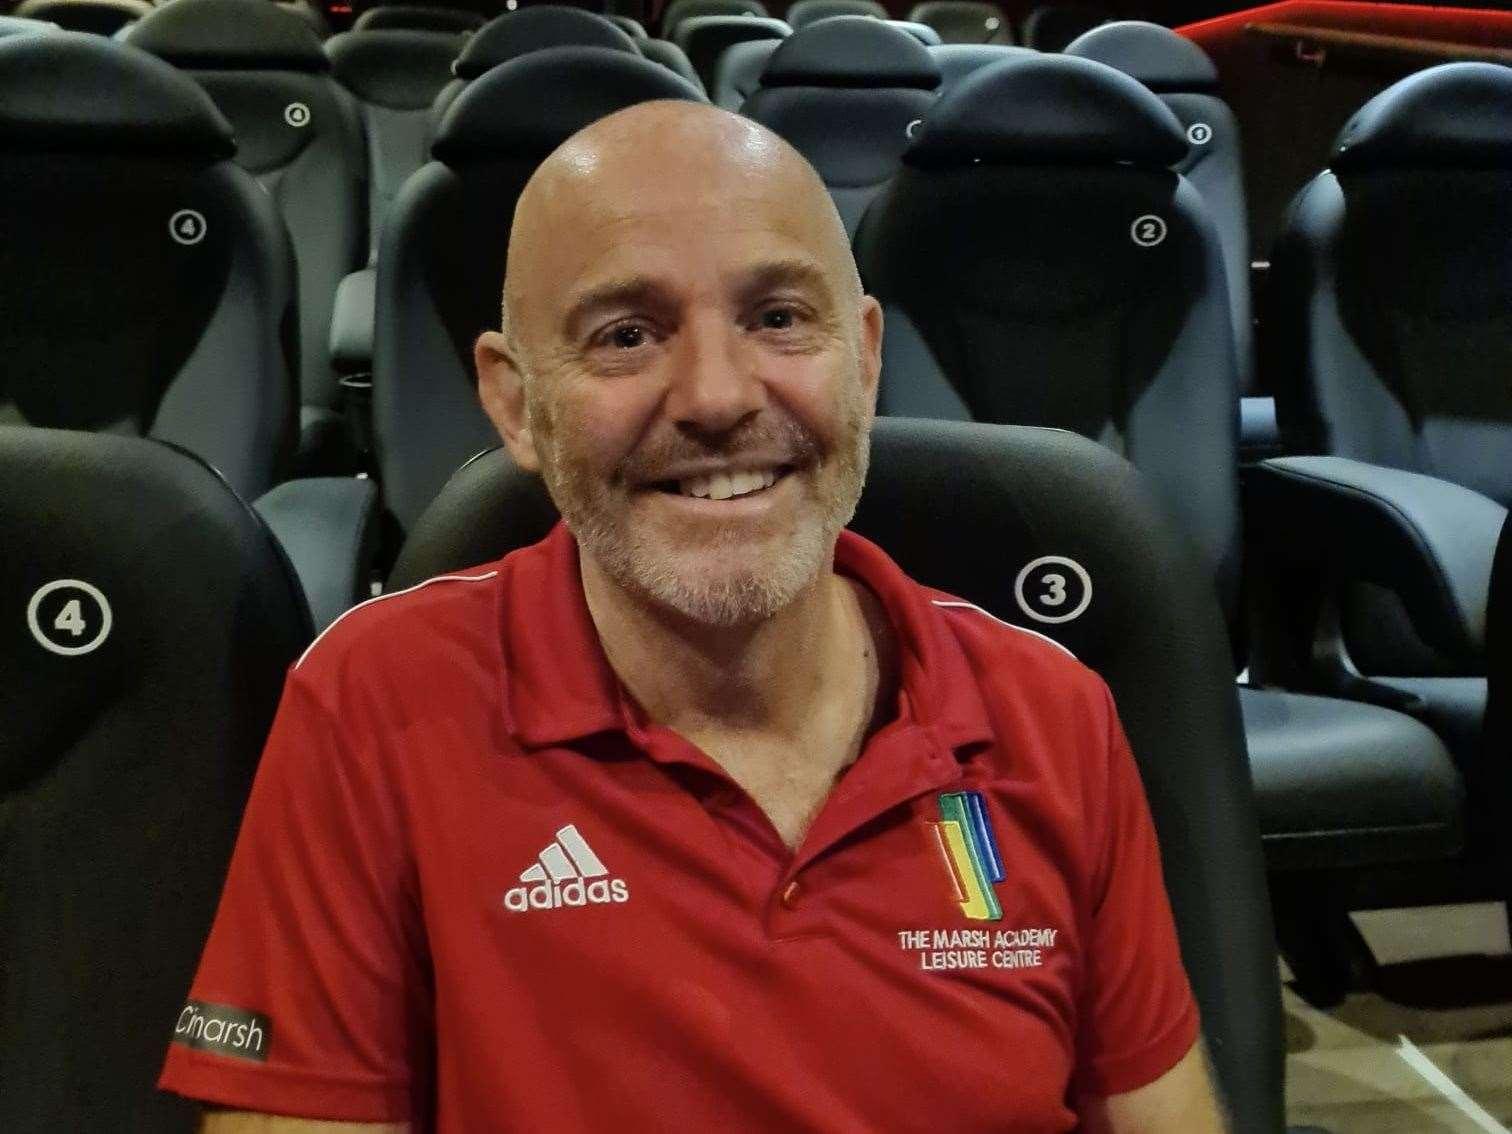 Manager Jason Mahoney